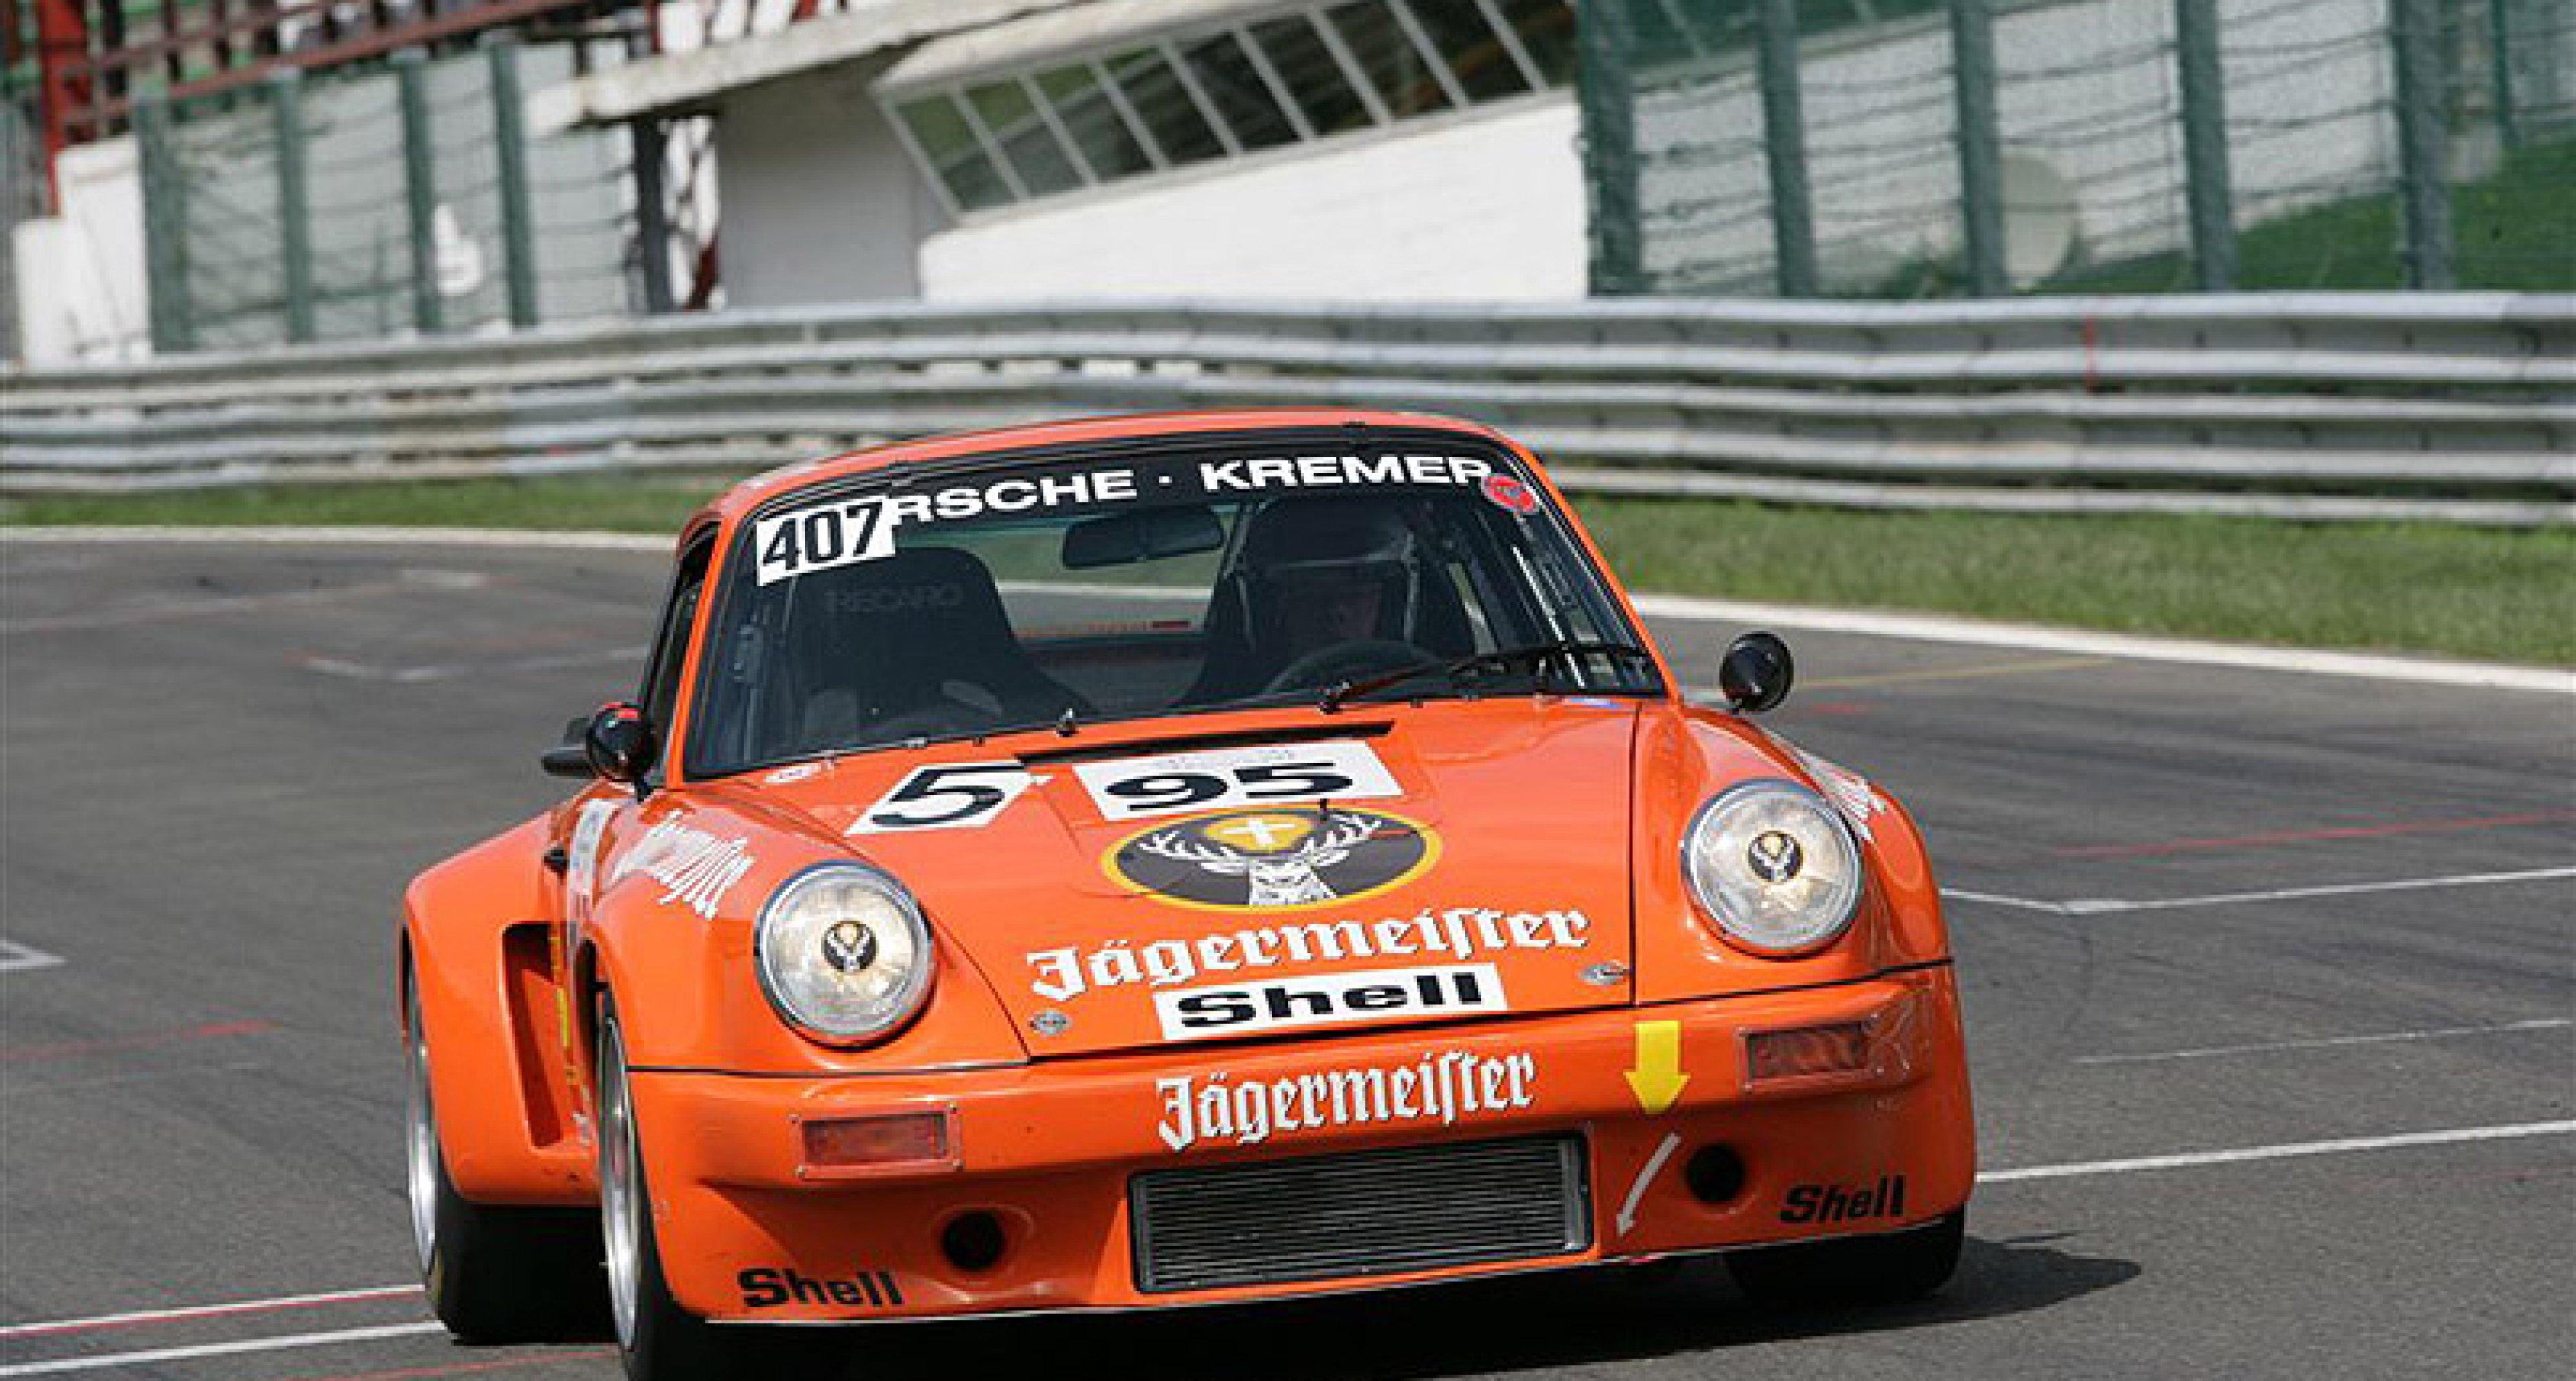 Das Sportfahrer-Highlight 2010: Tracktest in Spanien & Portugal